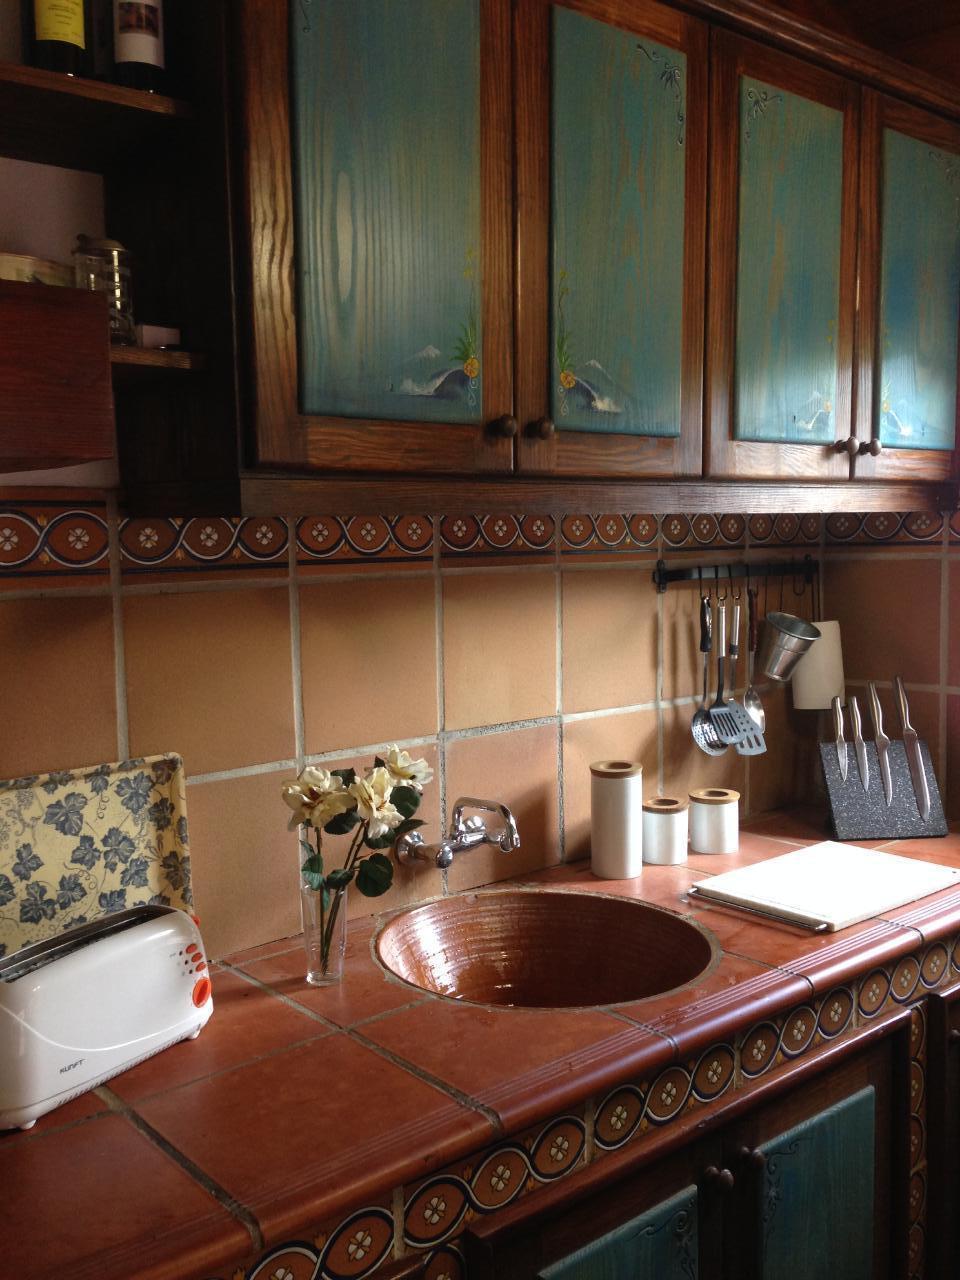 Maison de vacances Casita auf luxuriöser Finca in idyllischer Lage, Whirlpool, Atlantik- und Teidepanorama (2397261), Tacoronte, Ténérife, Iles Canaries, Espagne, image 8